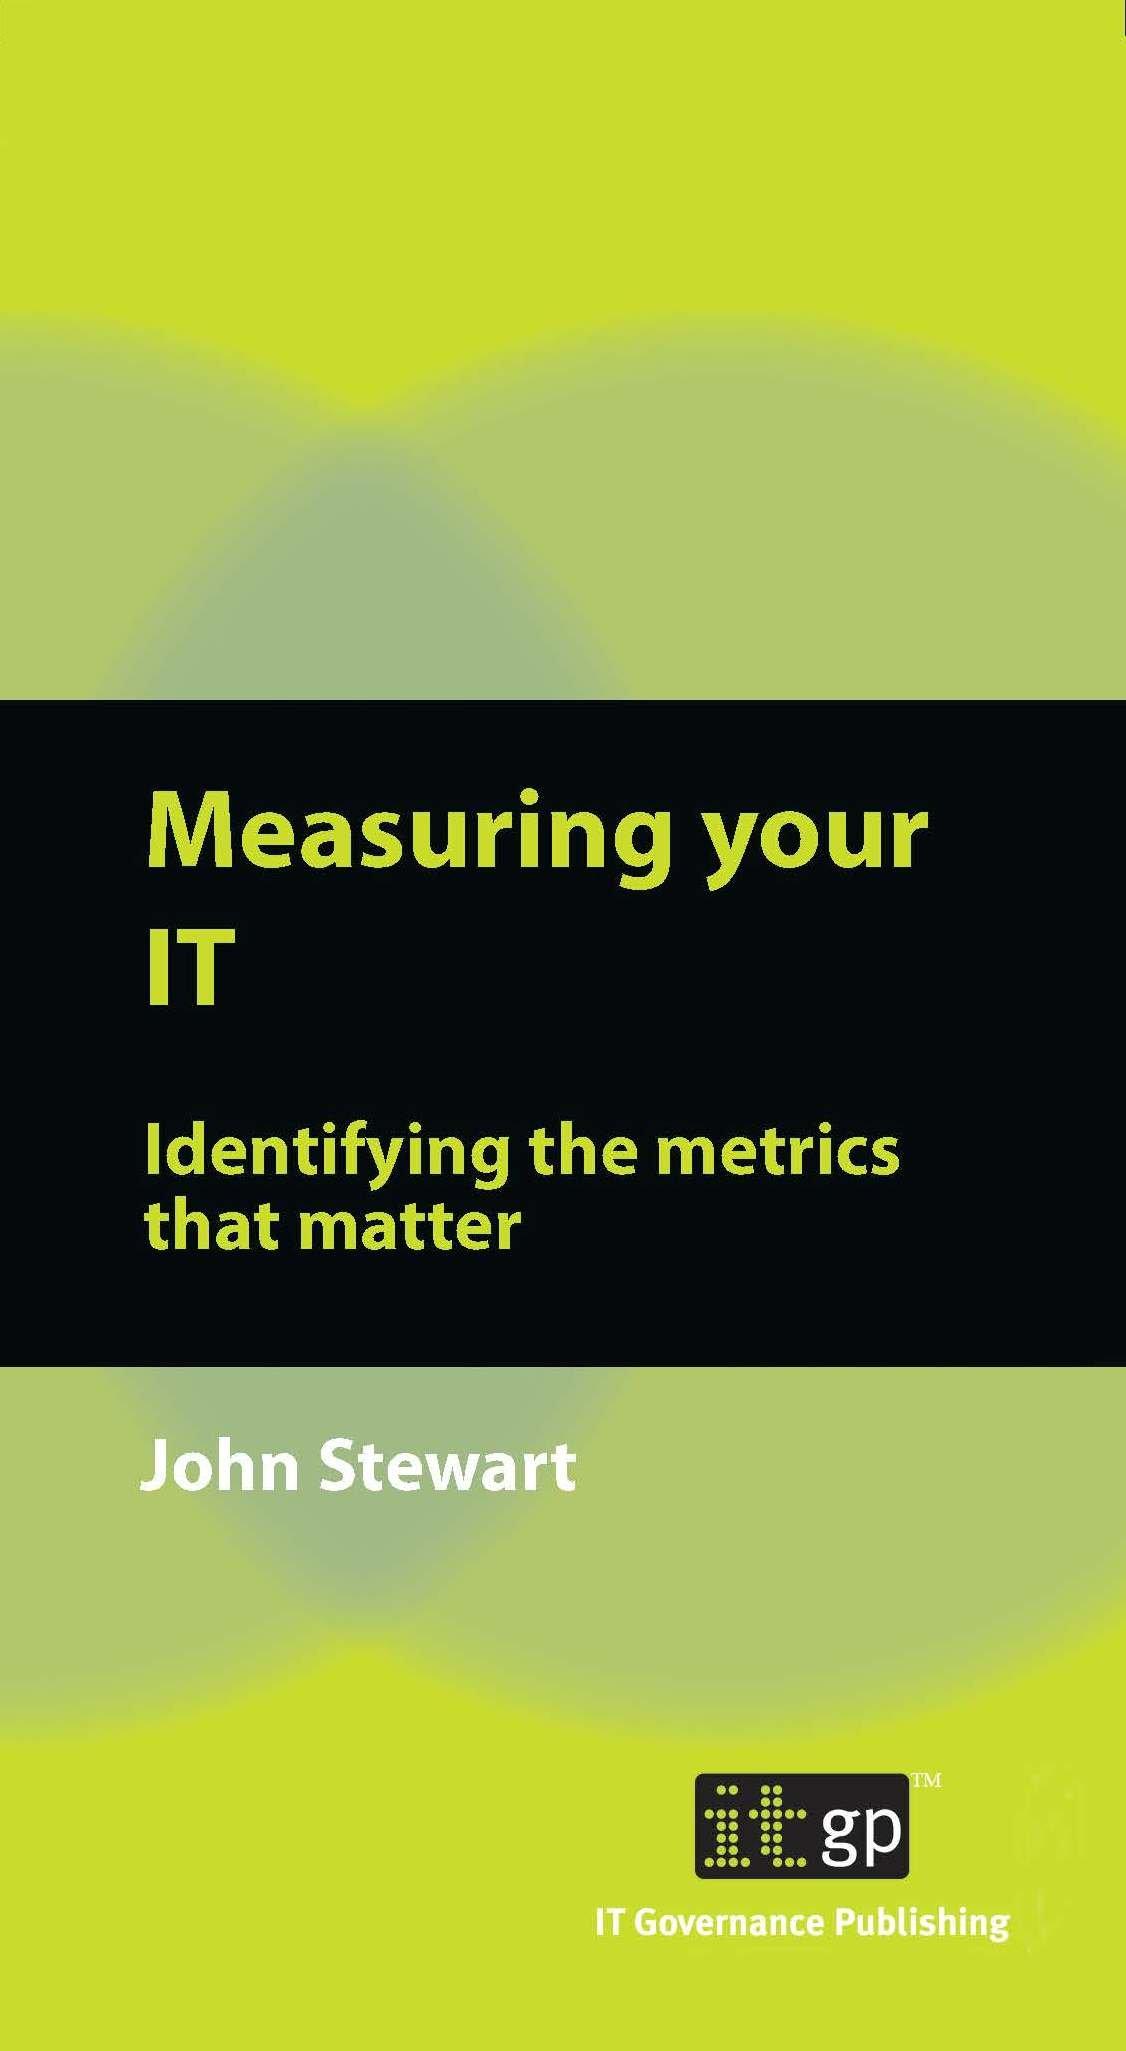 Measuring Your IT: Identifying The Metrics That Matter